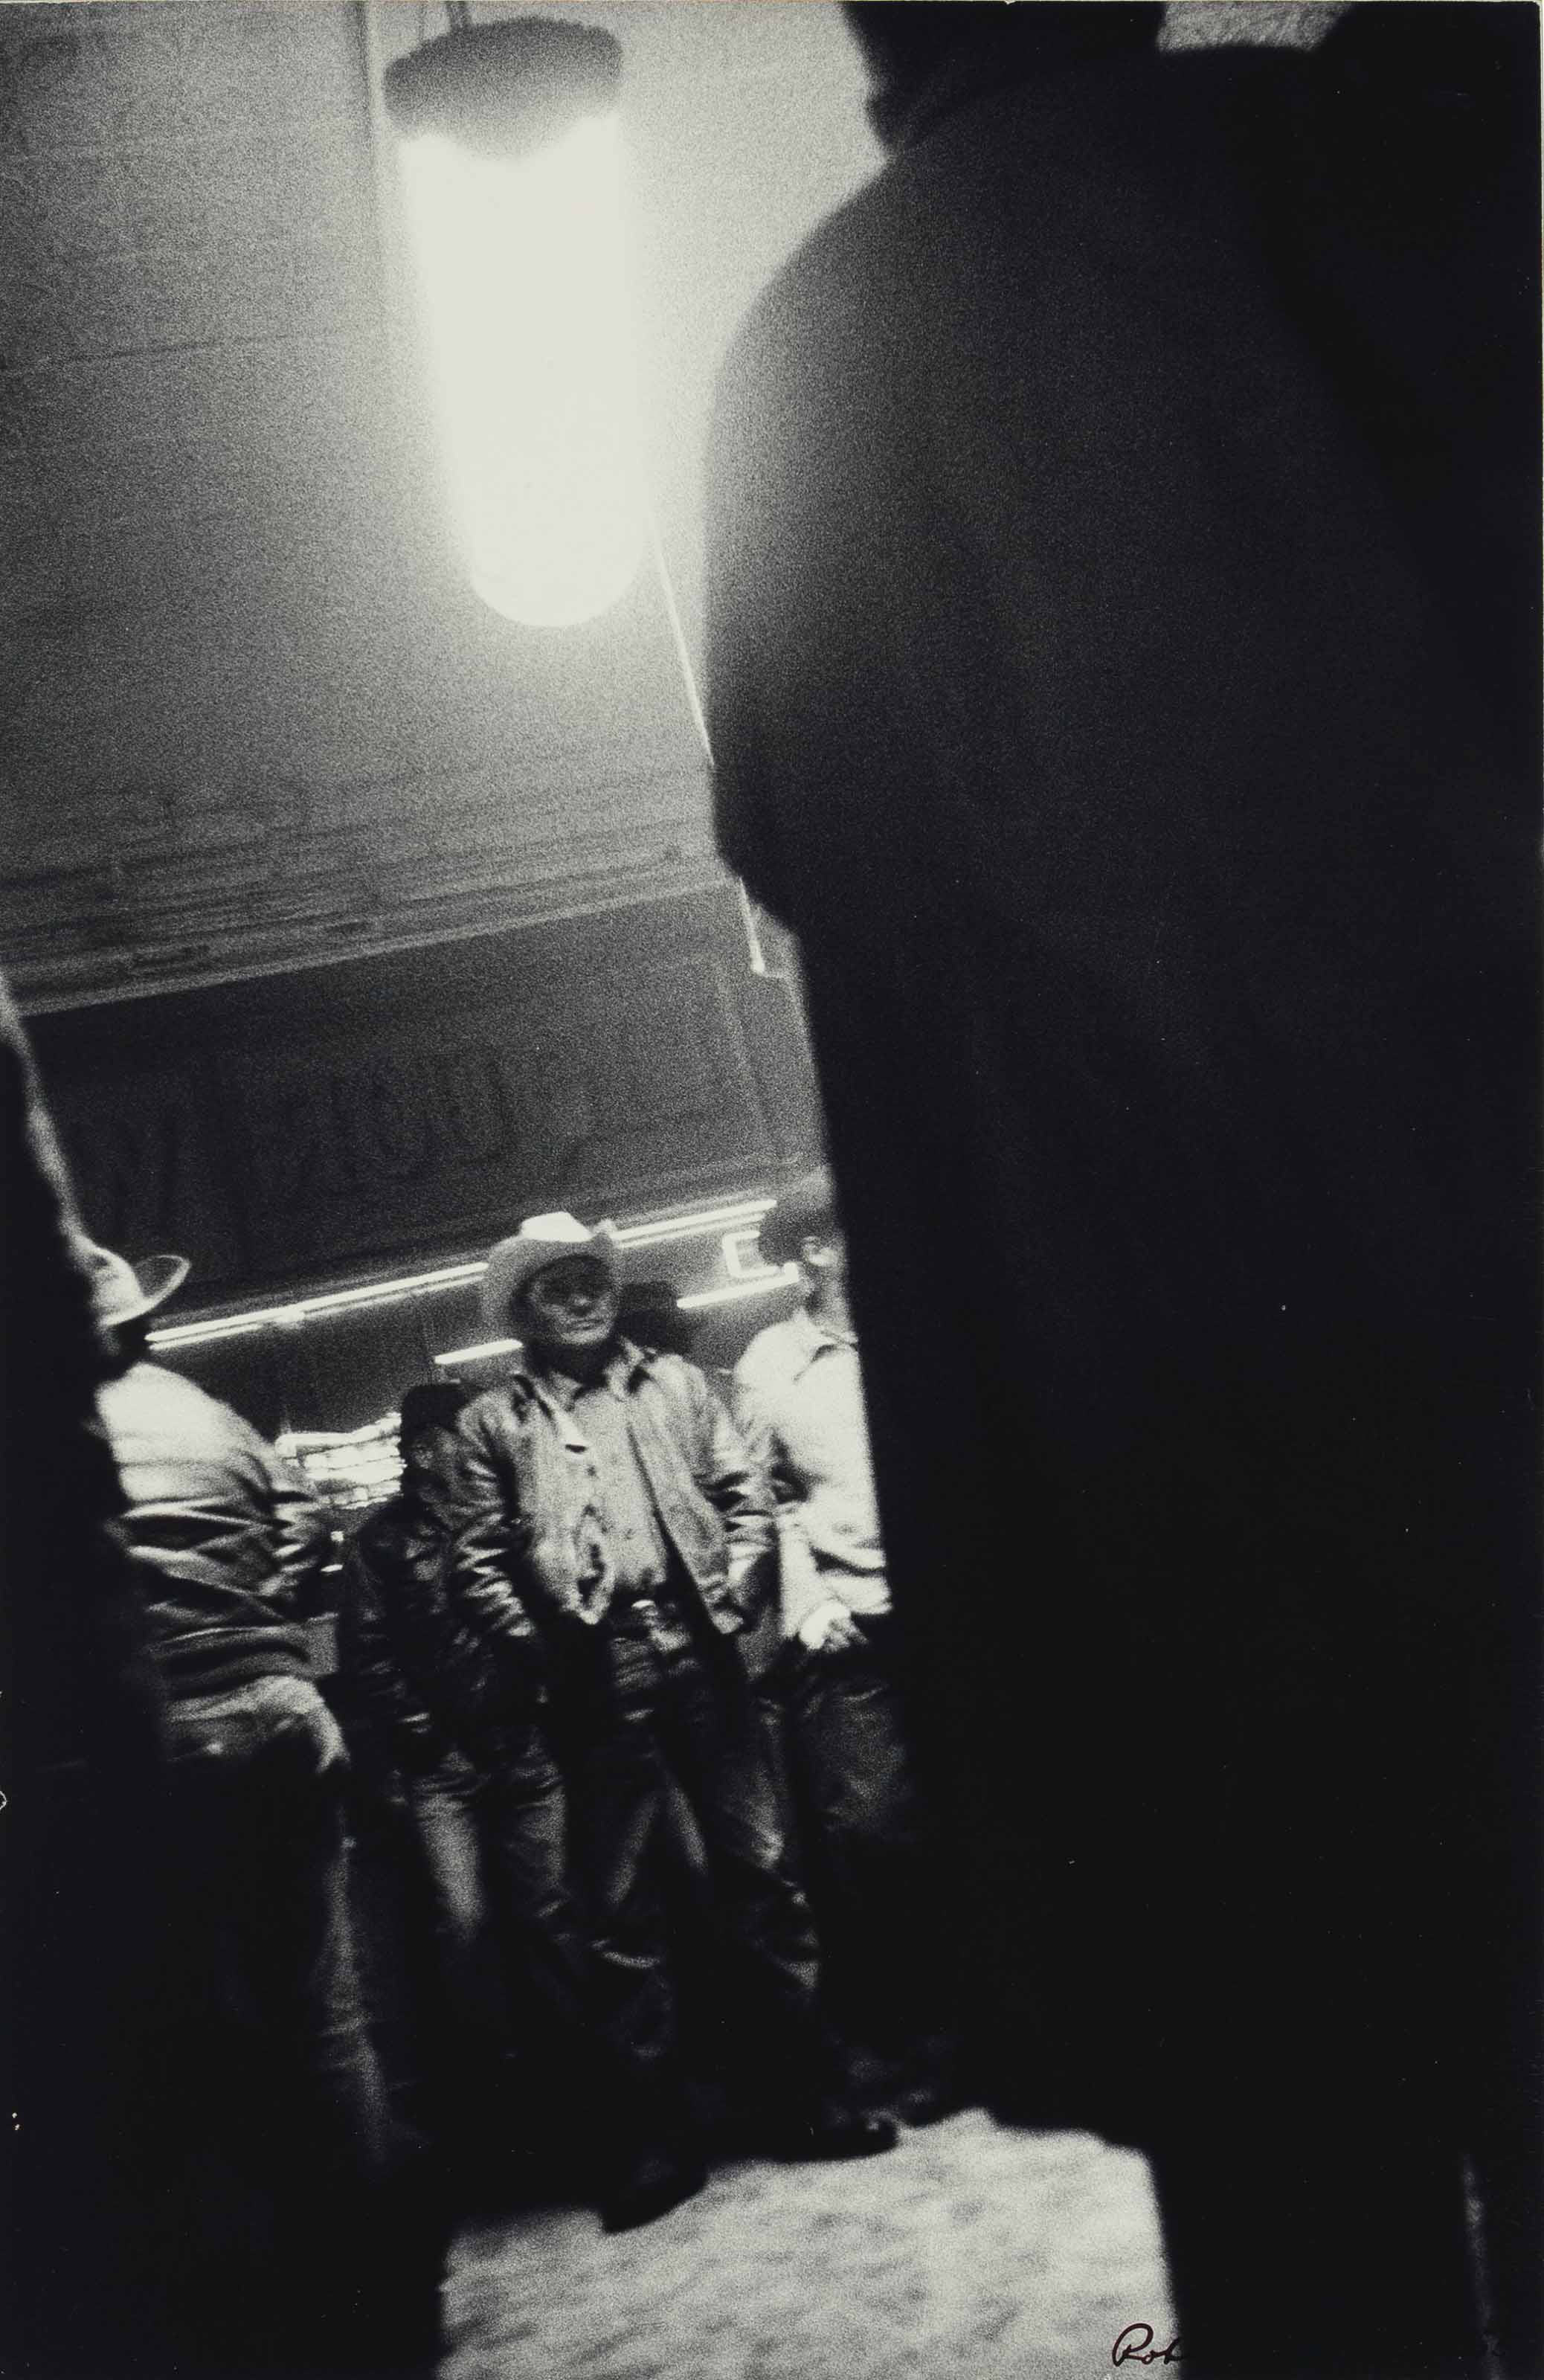 Bar - Gallup, New Mexico, 1955